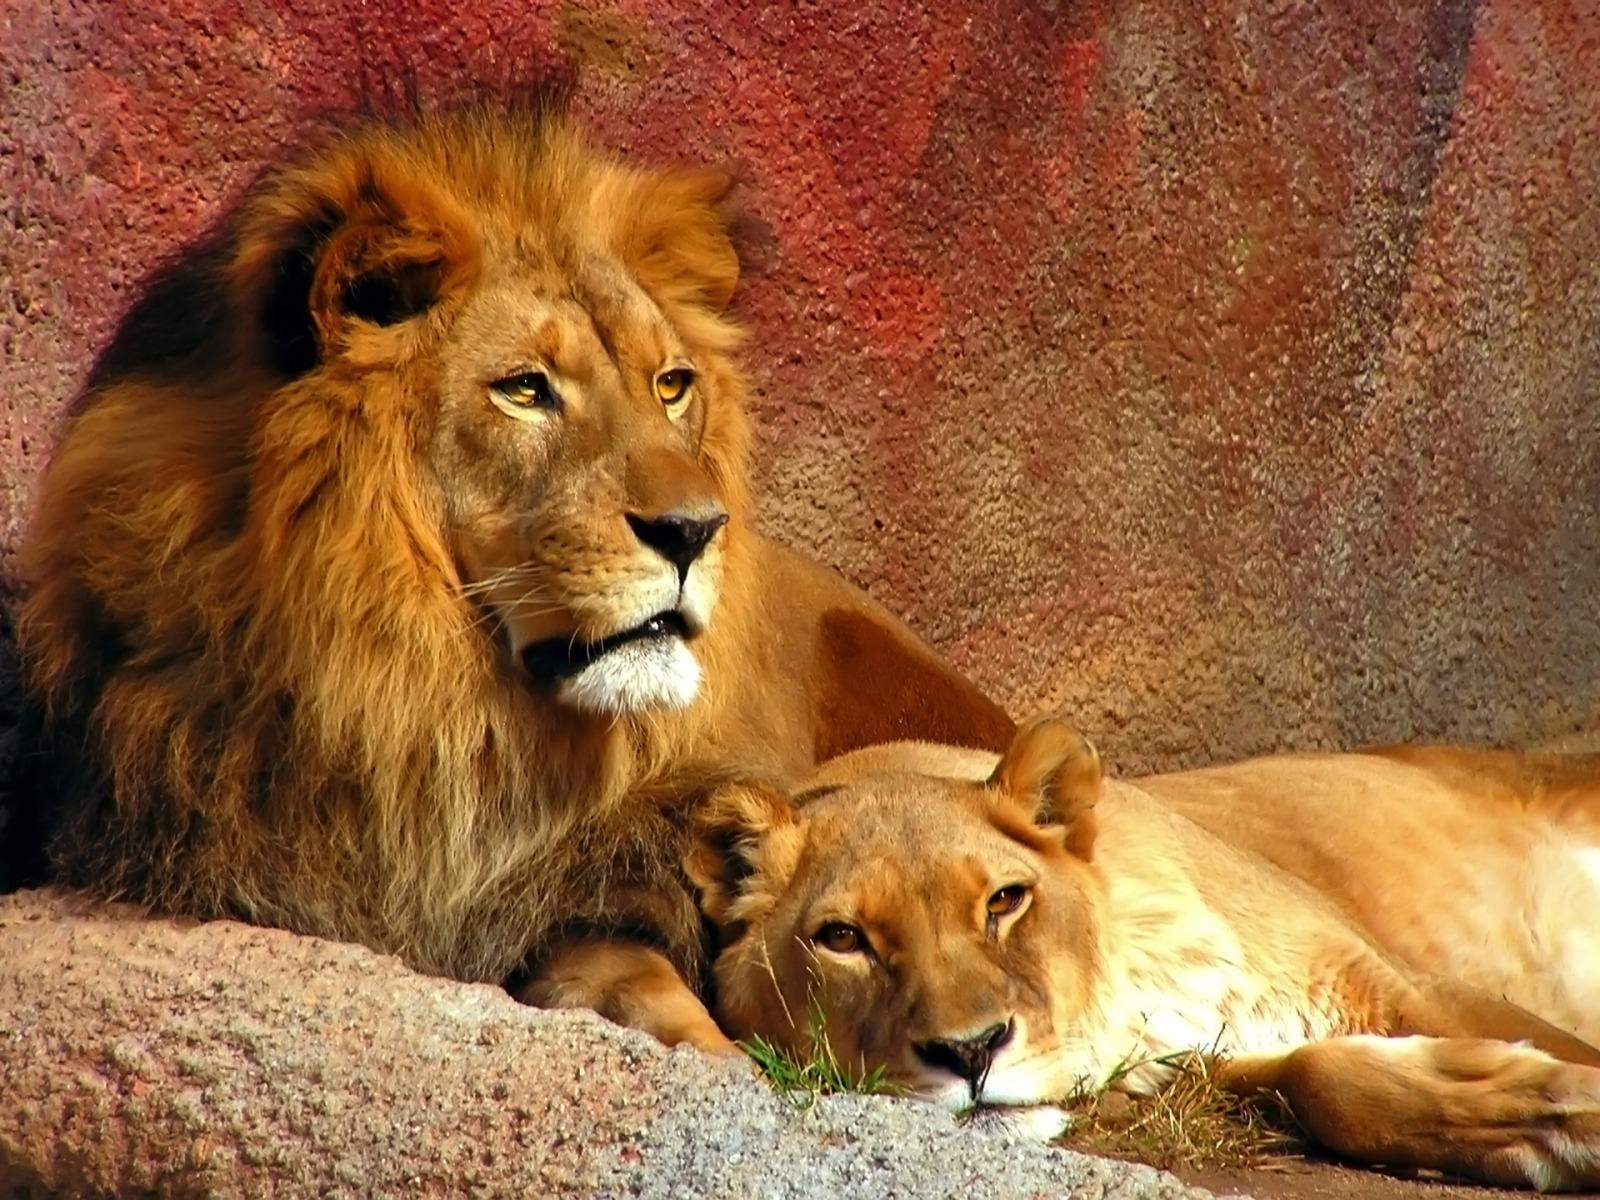 Lion Wallpapers | 3D Wallpaper | Nature Wallpaper | Free Download Wallpaper